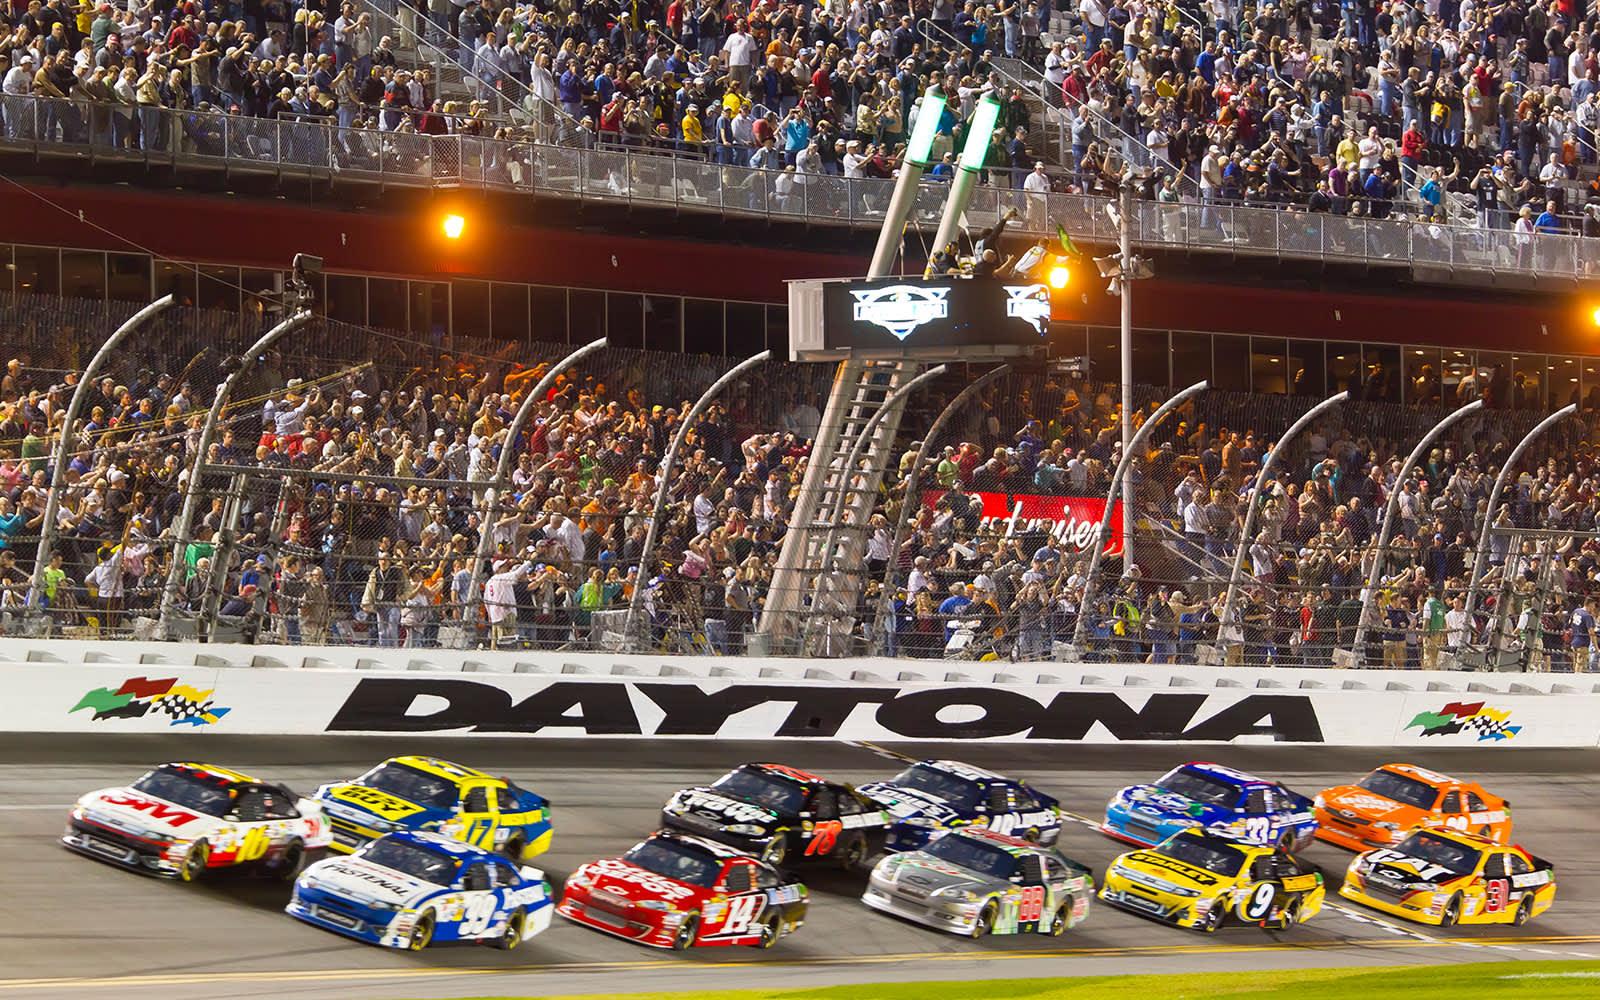 Daytona 500 Special Rates at Florida Resort